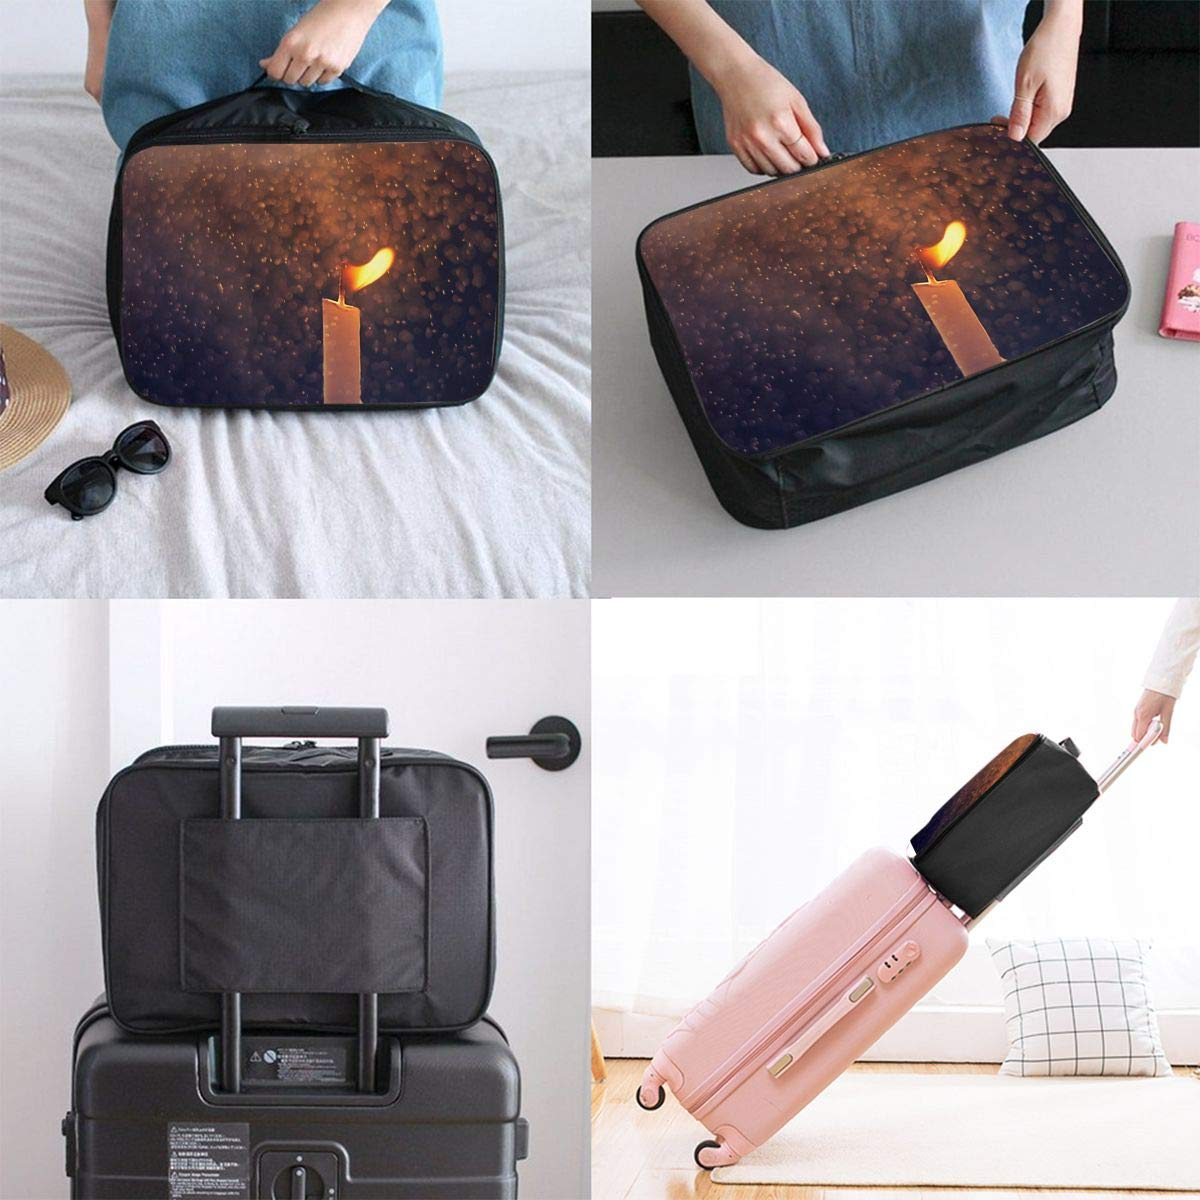 Travel Luggage Duffle Bag Lightweight Portable Handbag Candle Fire Print Large Capacity Waterproof Foldable Storage Tote